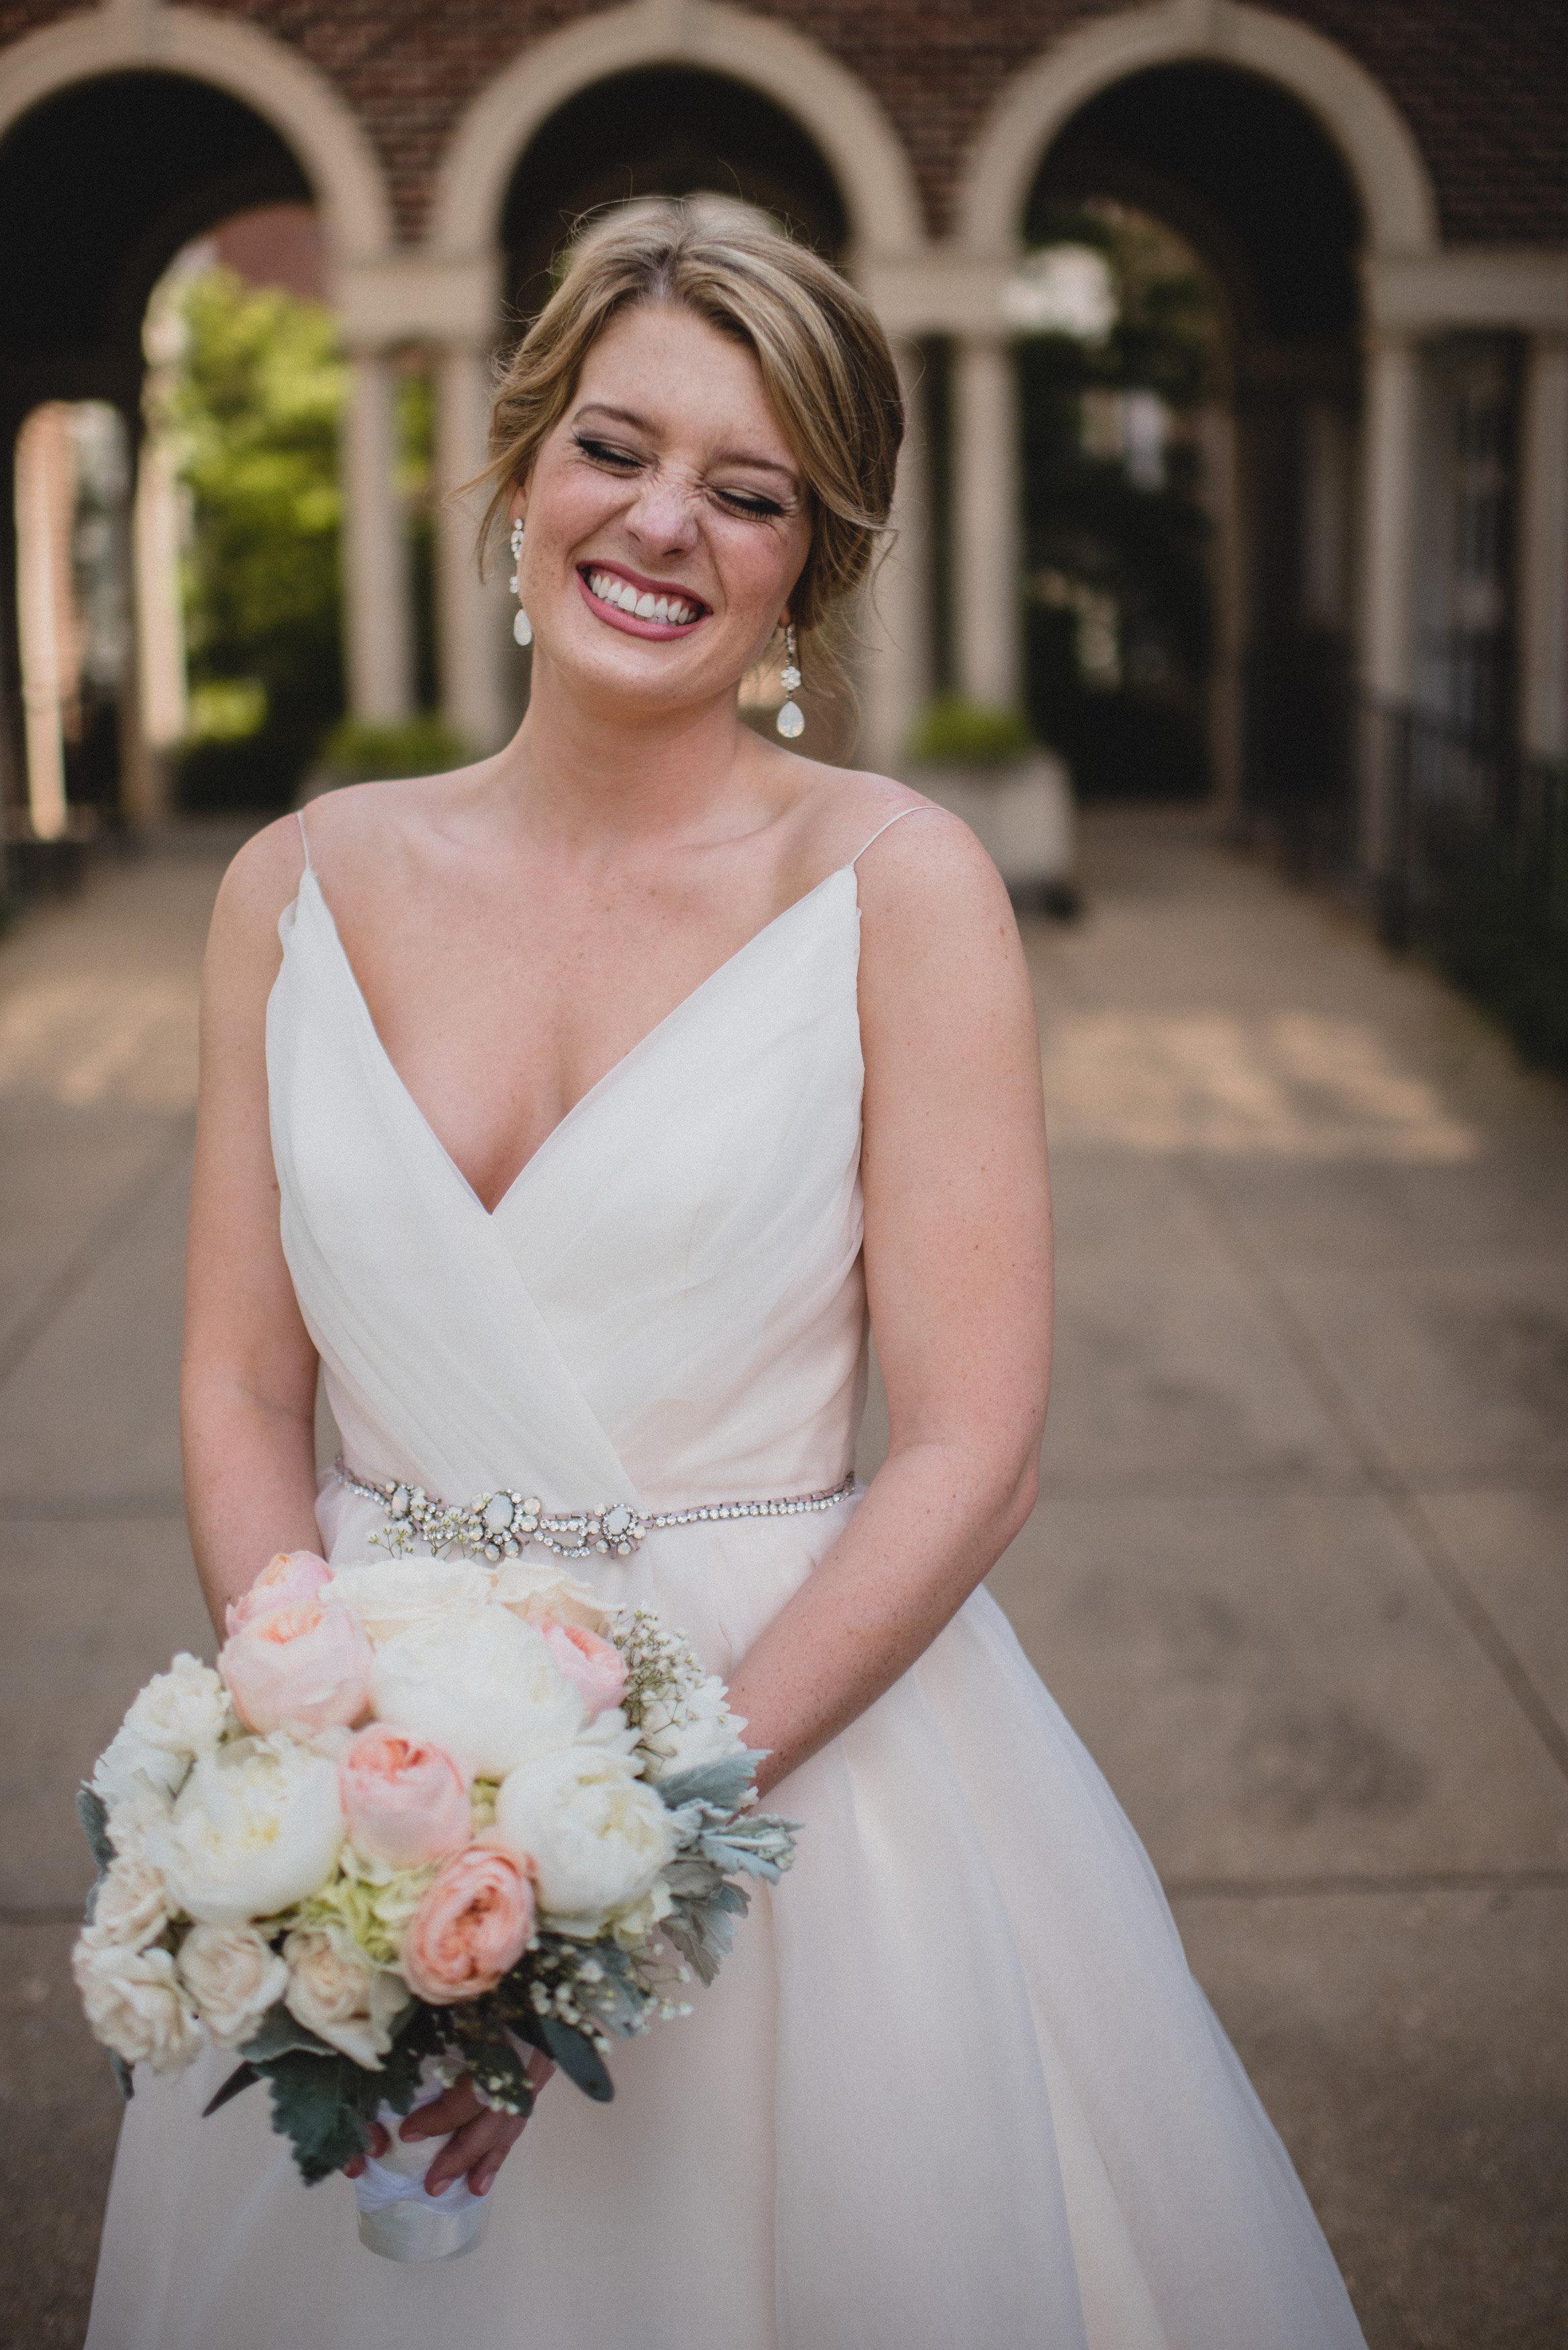 bridal wedding photography at paris yates chapel at ole miss in oxford, ms